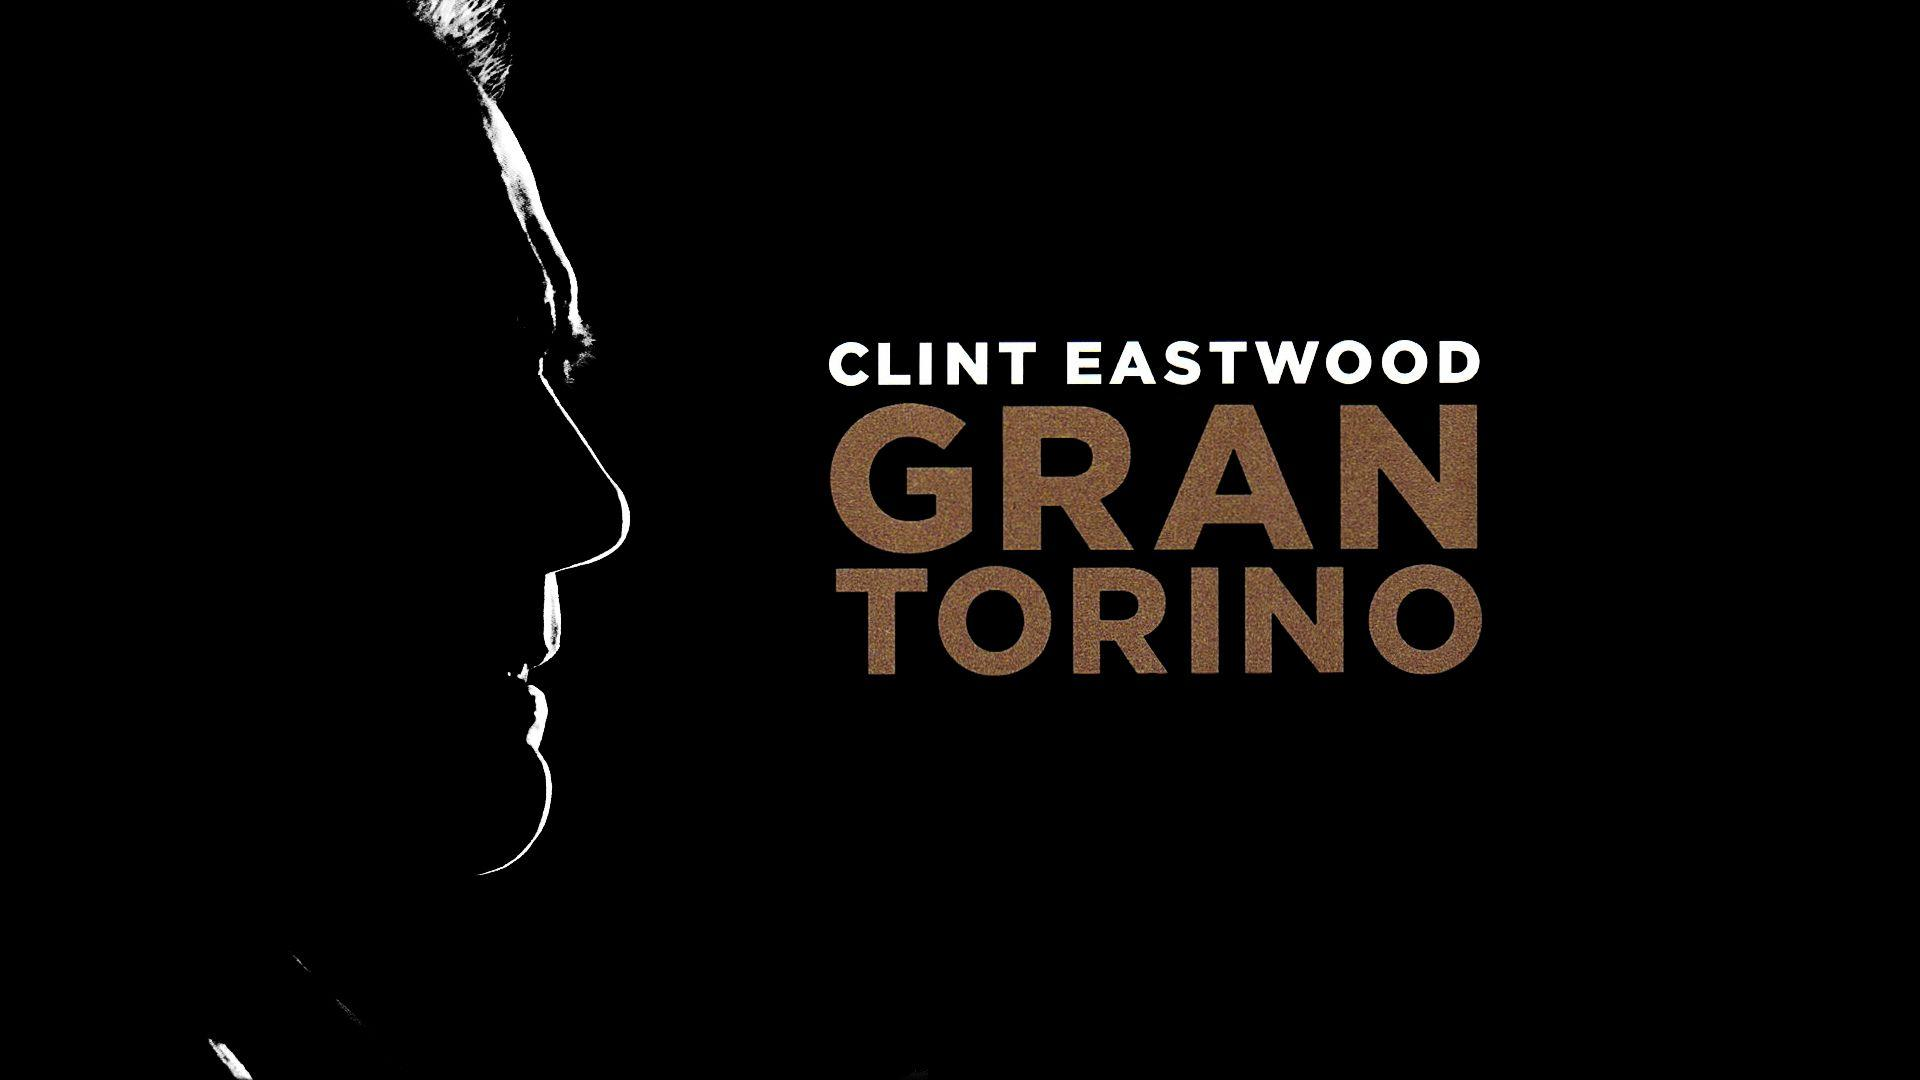 Gran Torino Wallpapers - Top Free Gran Torino Backgrounds - WallpaperAccess